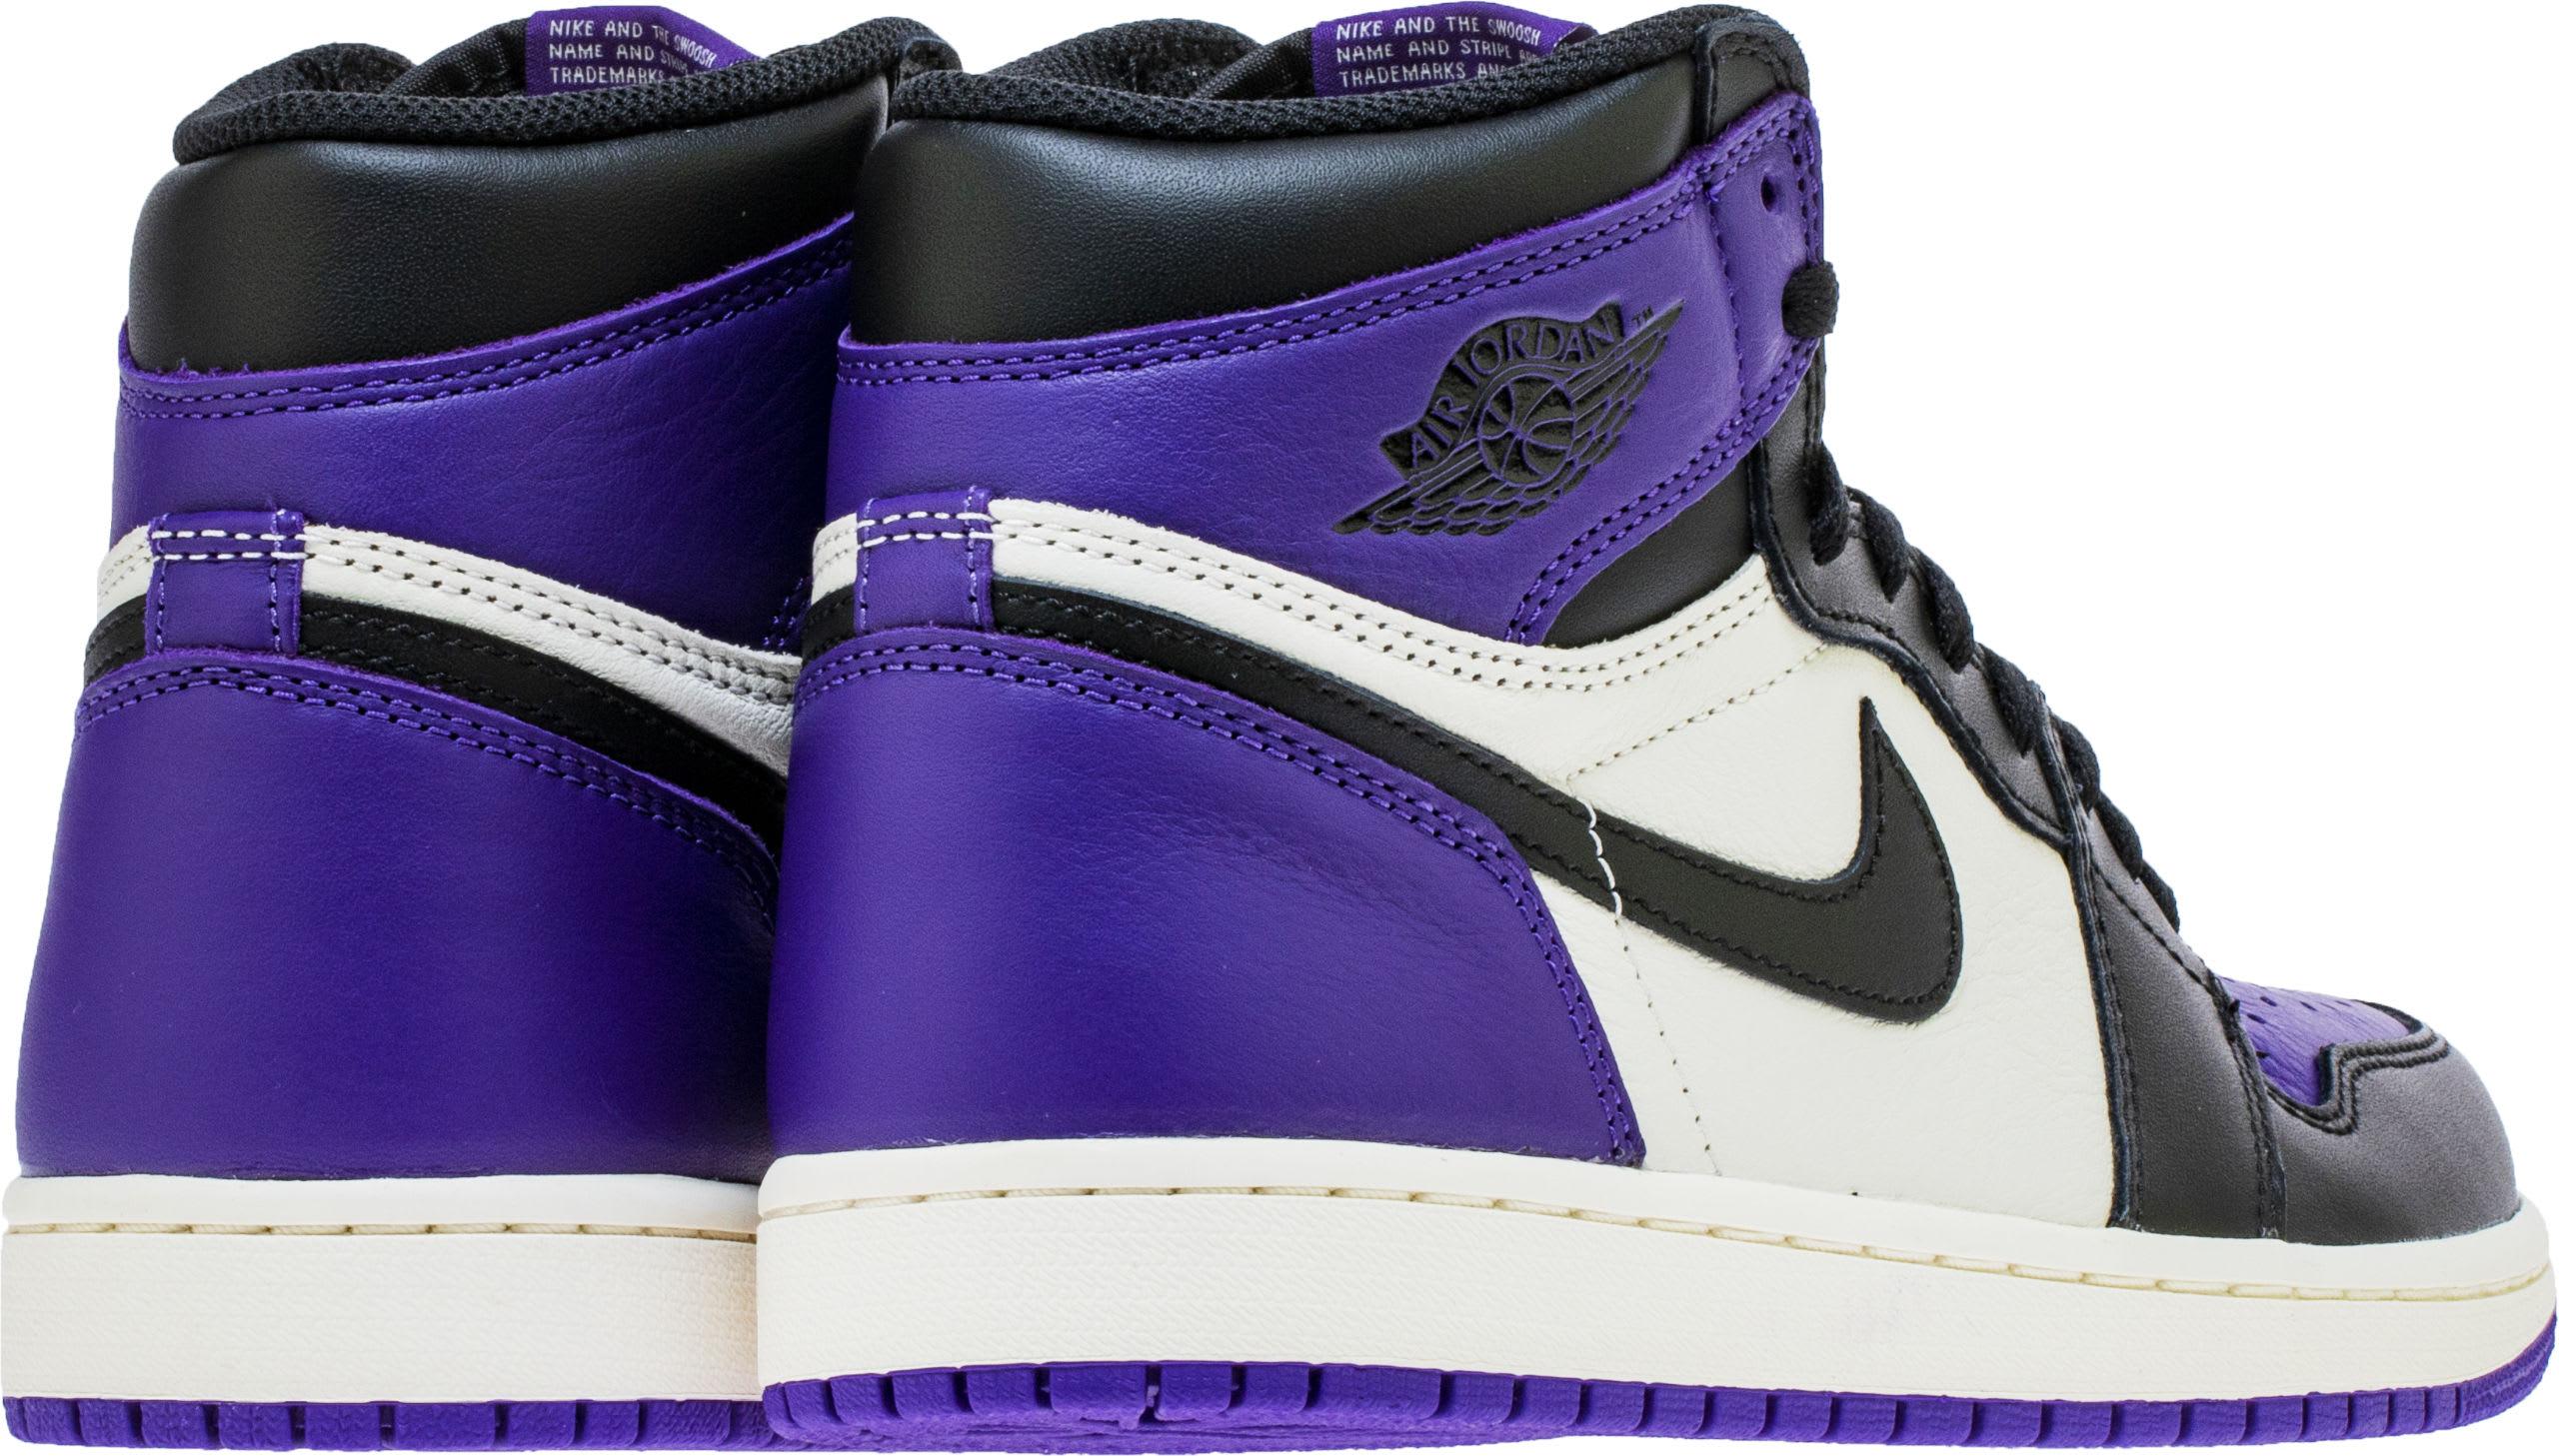 hot sale online c2119 88993 Image via Shoe Palace Air Jordan 1 High OG  Court Purple  555088-501 (Heel)